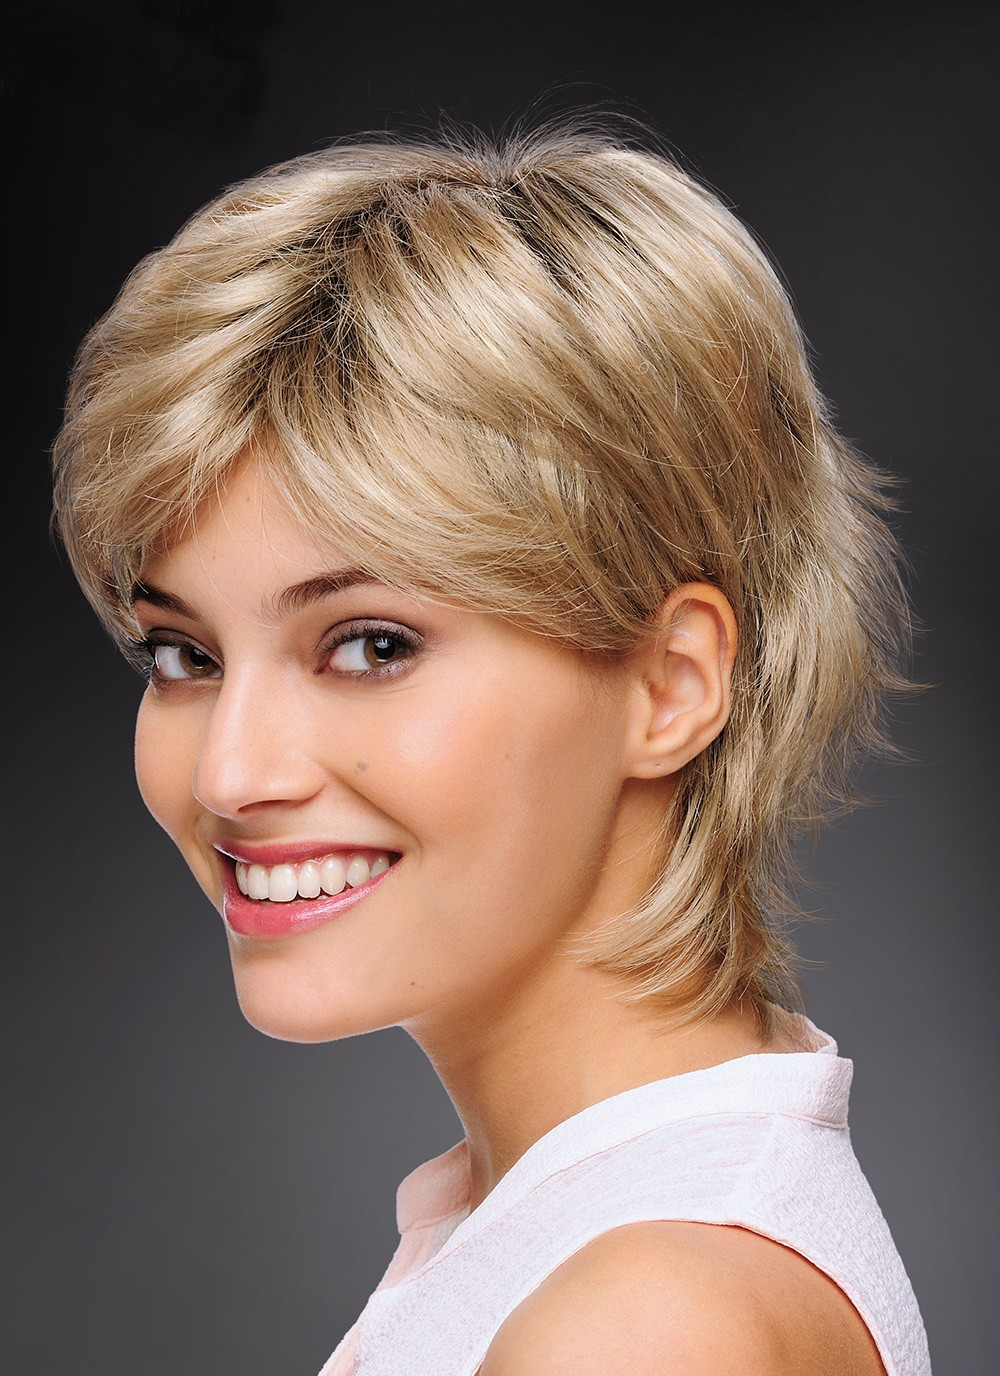 Fashionable Short Cut Blonde Synthetic Hair Ladies Wigs, Best Wigs Online Sale - Rewigs.com